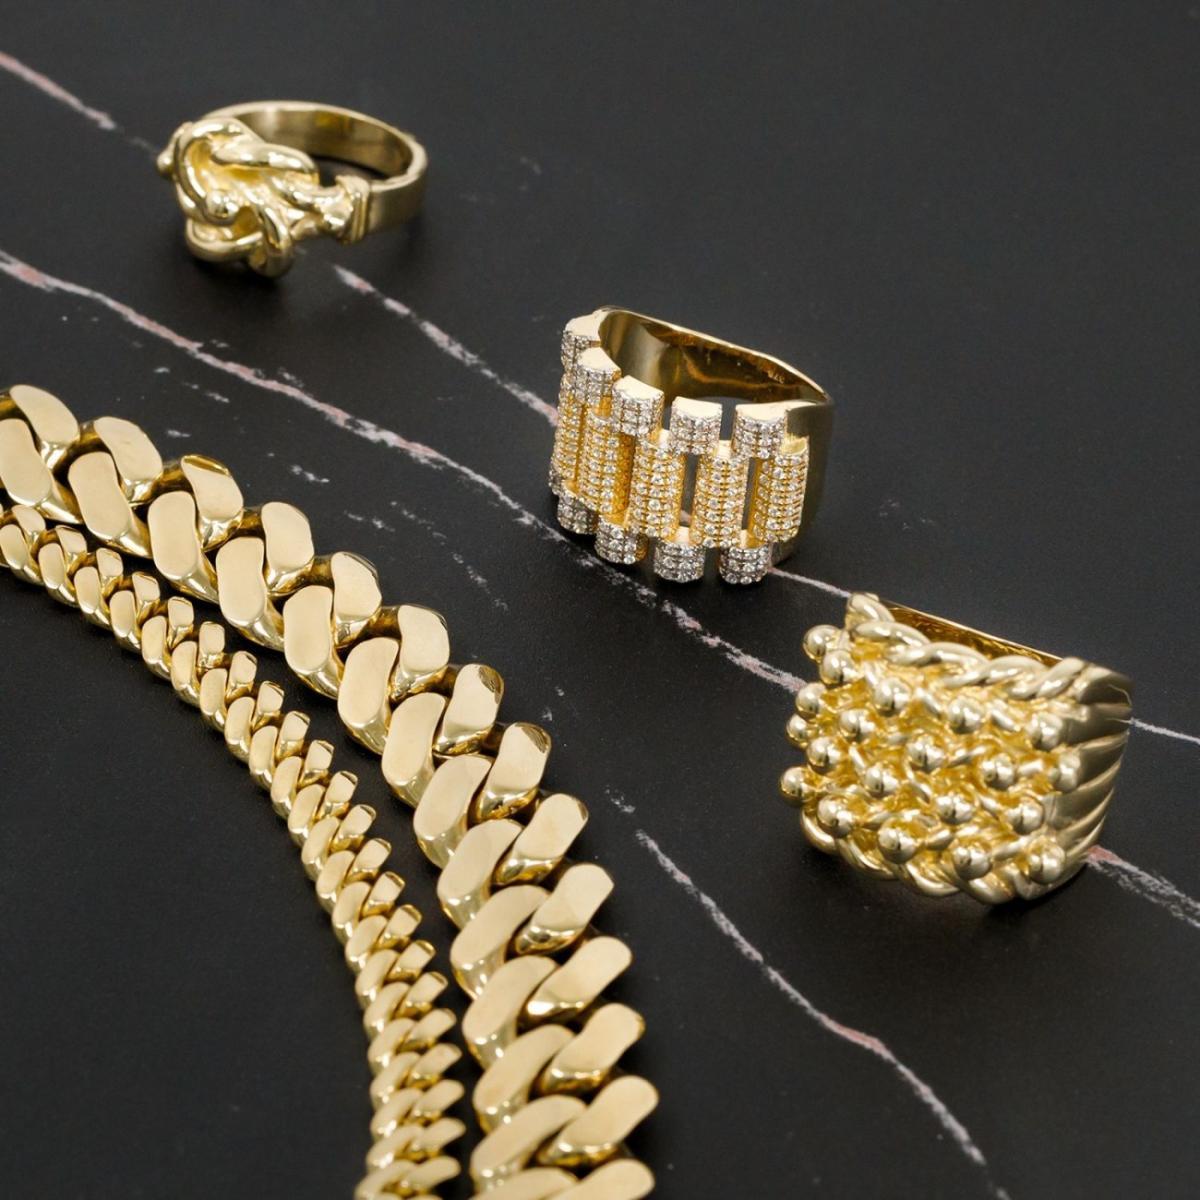 The World's Most Impressive Gold Jewellery Records